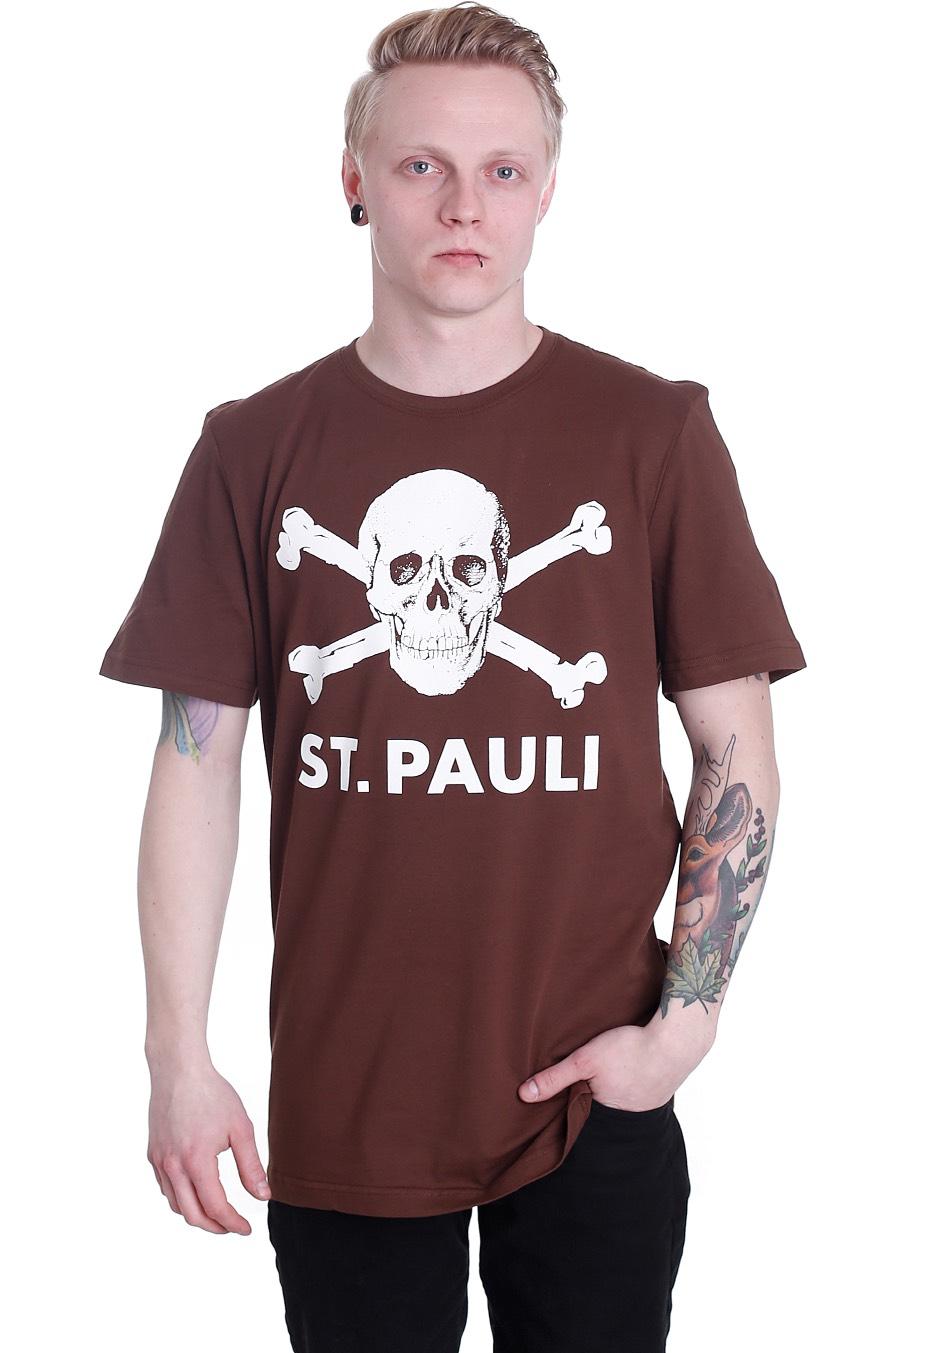 fc st pauli totenkopf braun t shirt official merchandise shop worldwide. Black Bedroom Furniture Sets. Home Design Ideas